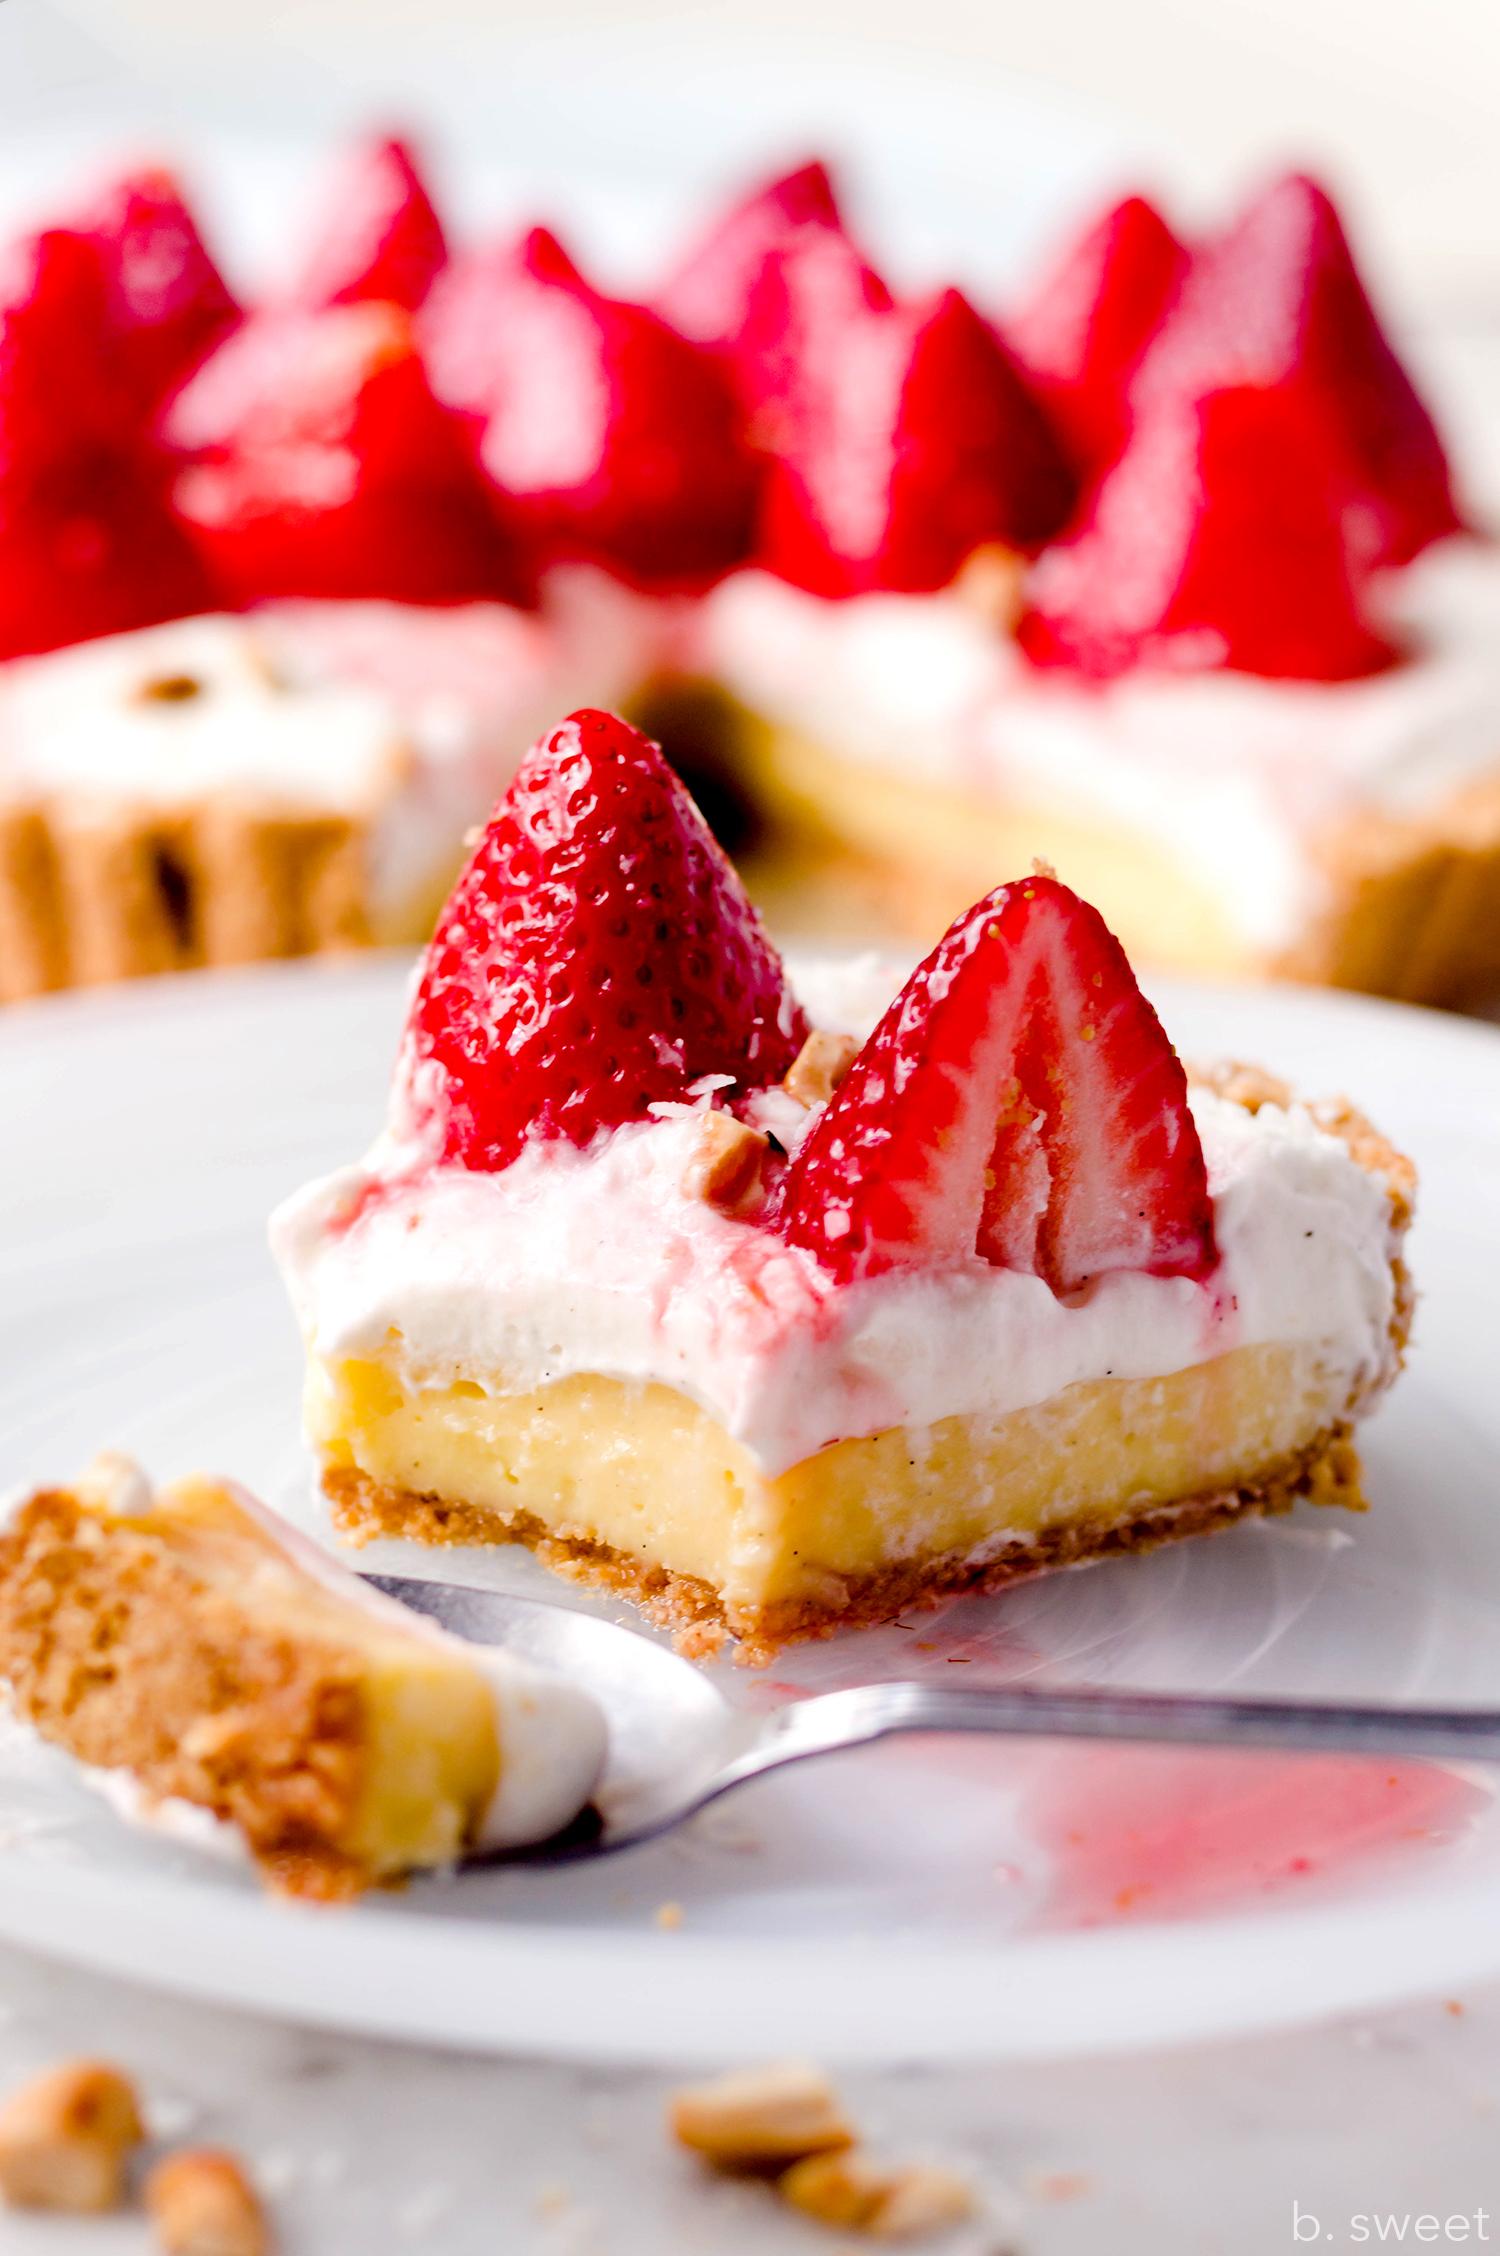 Strawberry Coconut Cashew Tart - b. sweet